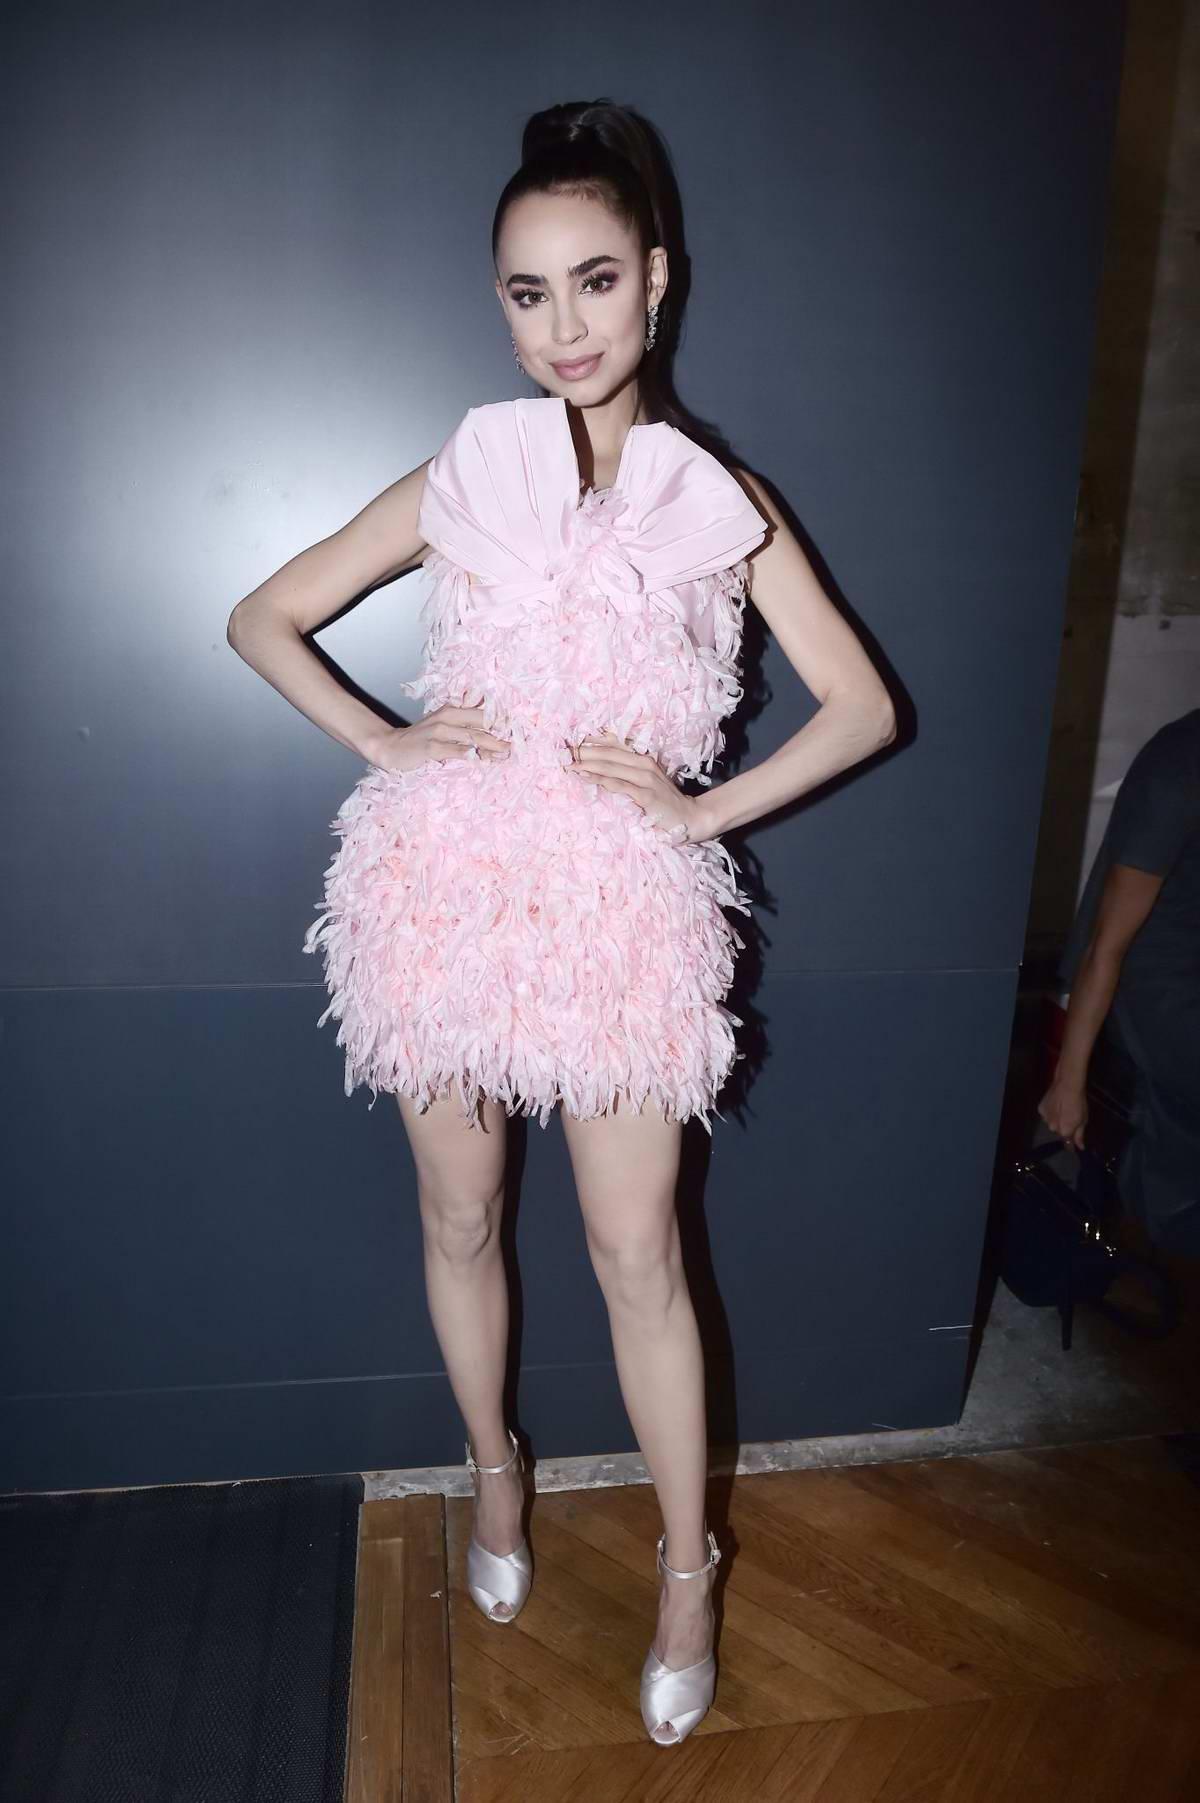 Sofia Carson attends the Giambattista Valli Womenswear Spring/Summer 2020 show during Paris Fashion Week in Pairs, France